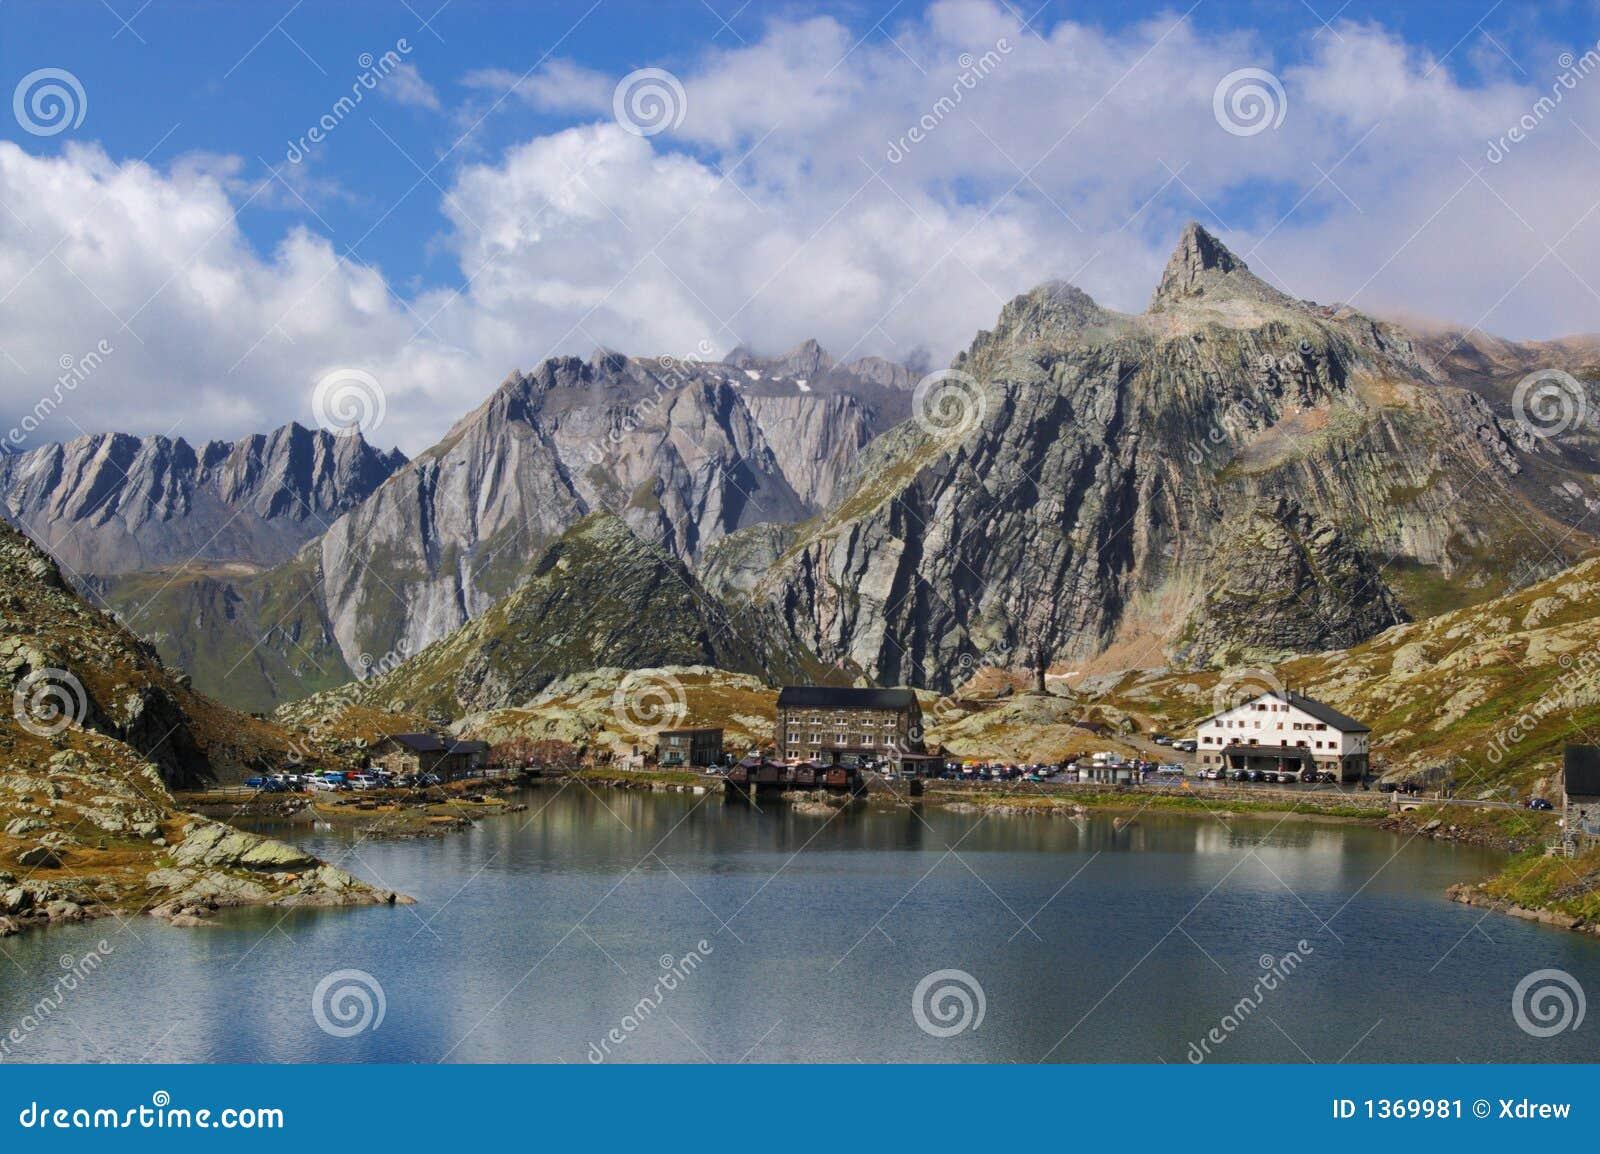 Swiss mountain lake landscape